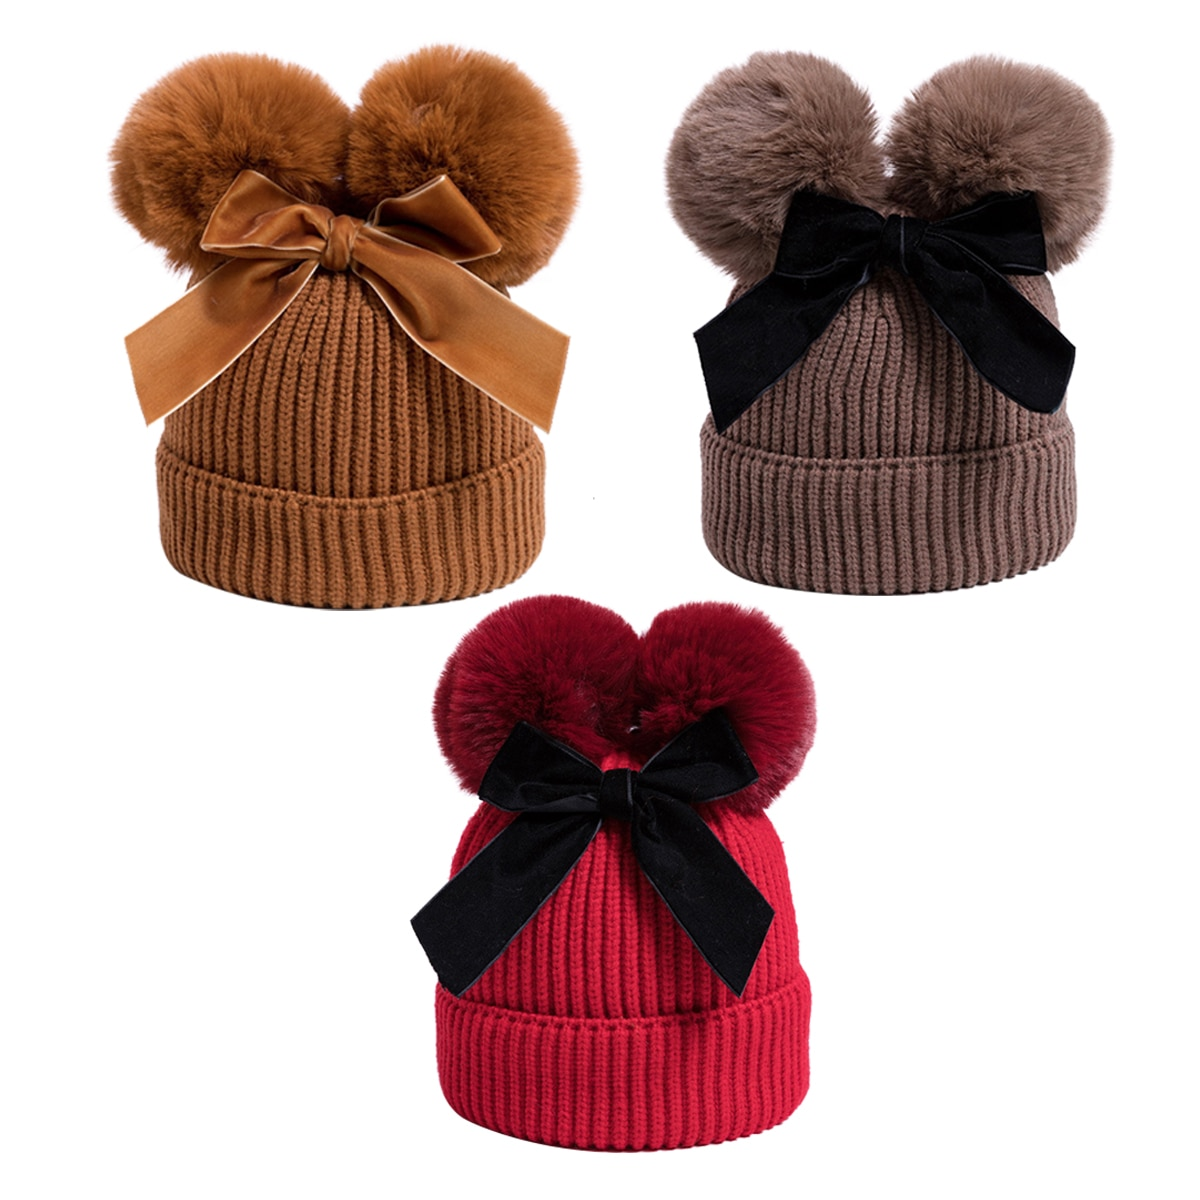 Baby Stuff Double Pompom Hat Winter Knitted Kids Baby Girl Hat Warm Thicker Children Infant Beanie Cap Bonnet Casquette Enfant